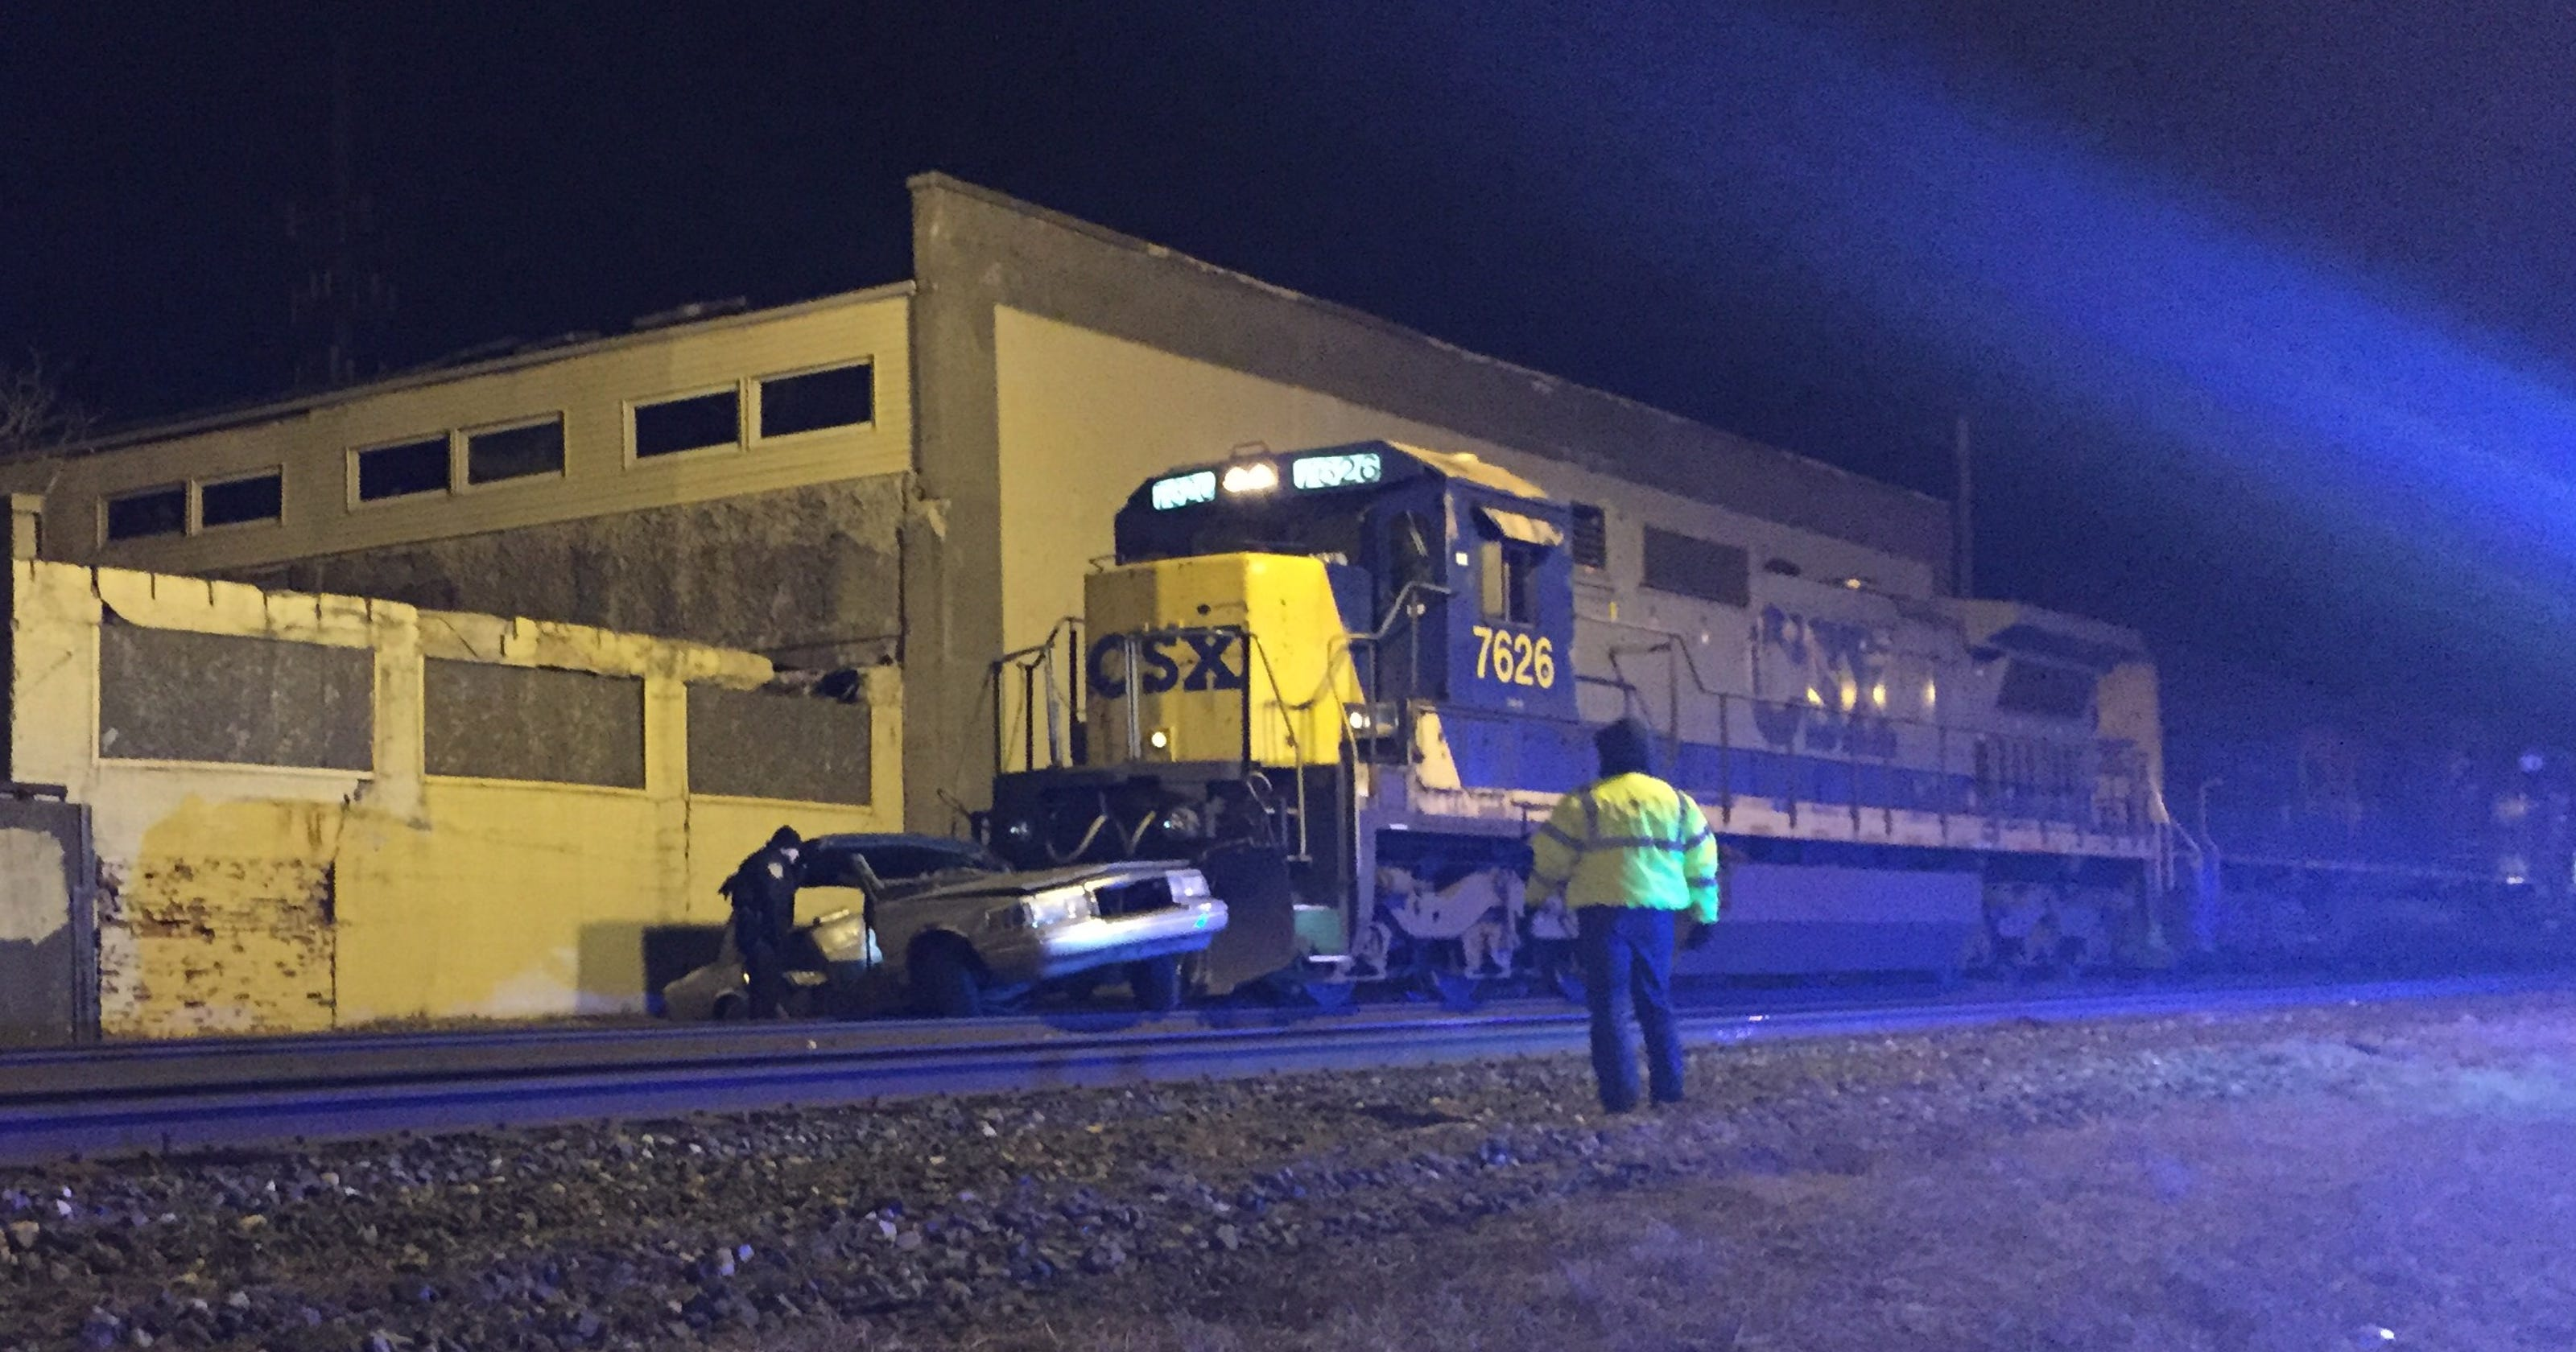 Train, car collide at Eastside crossing